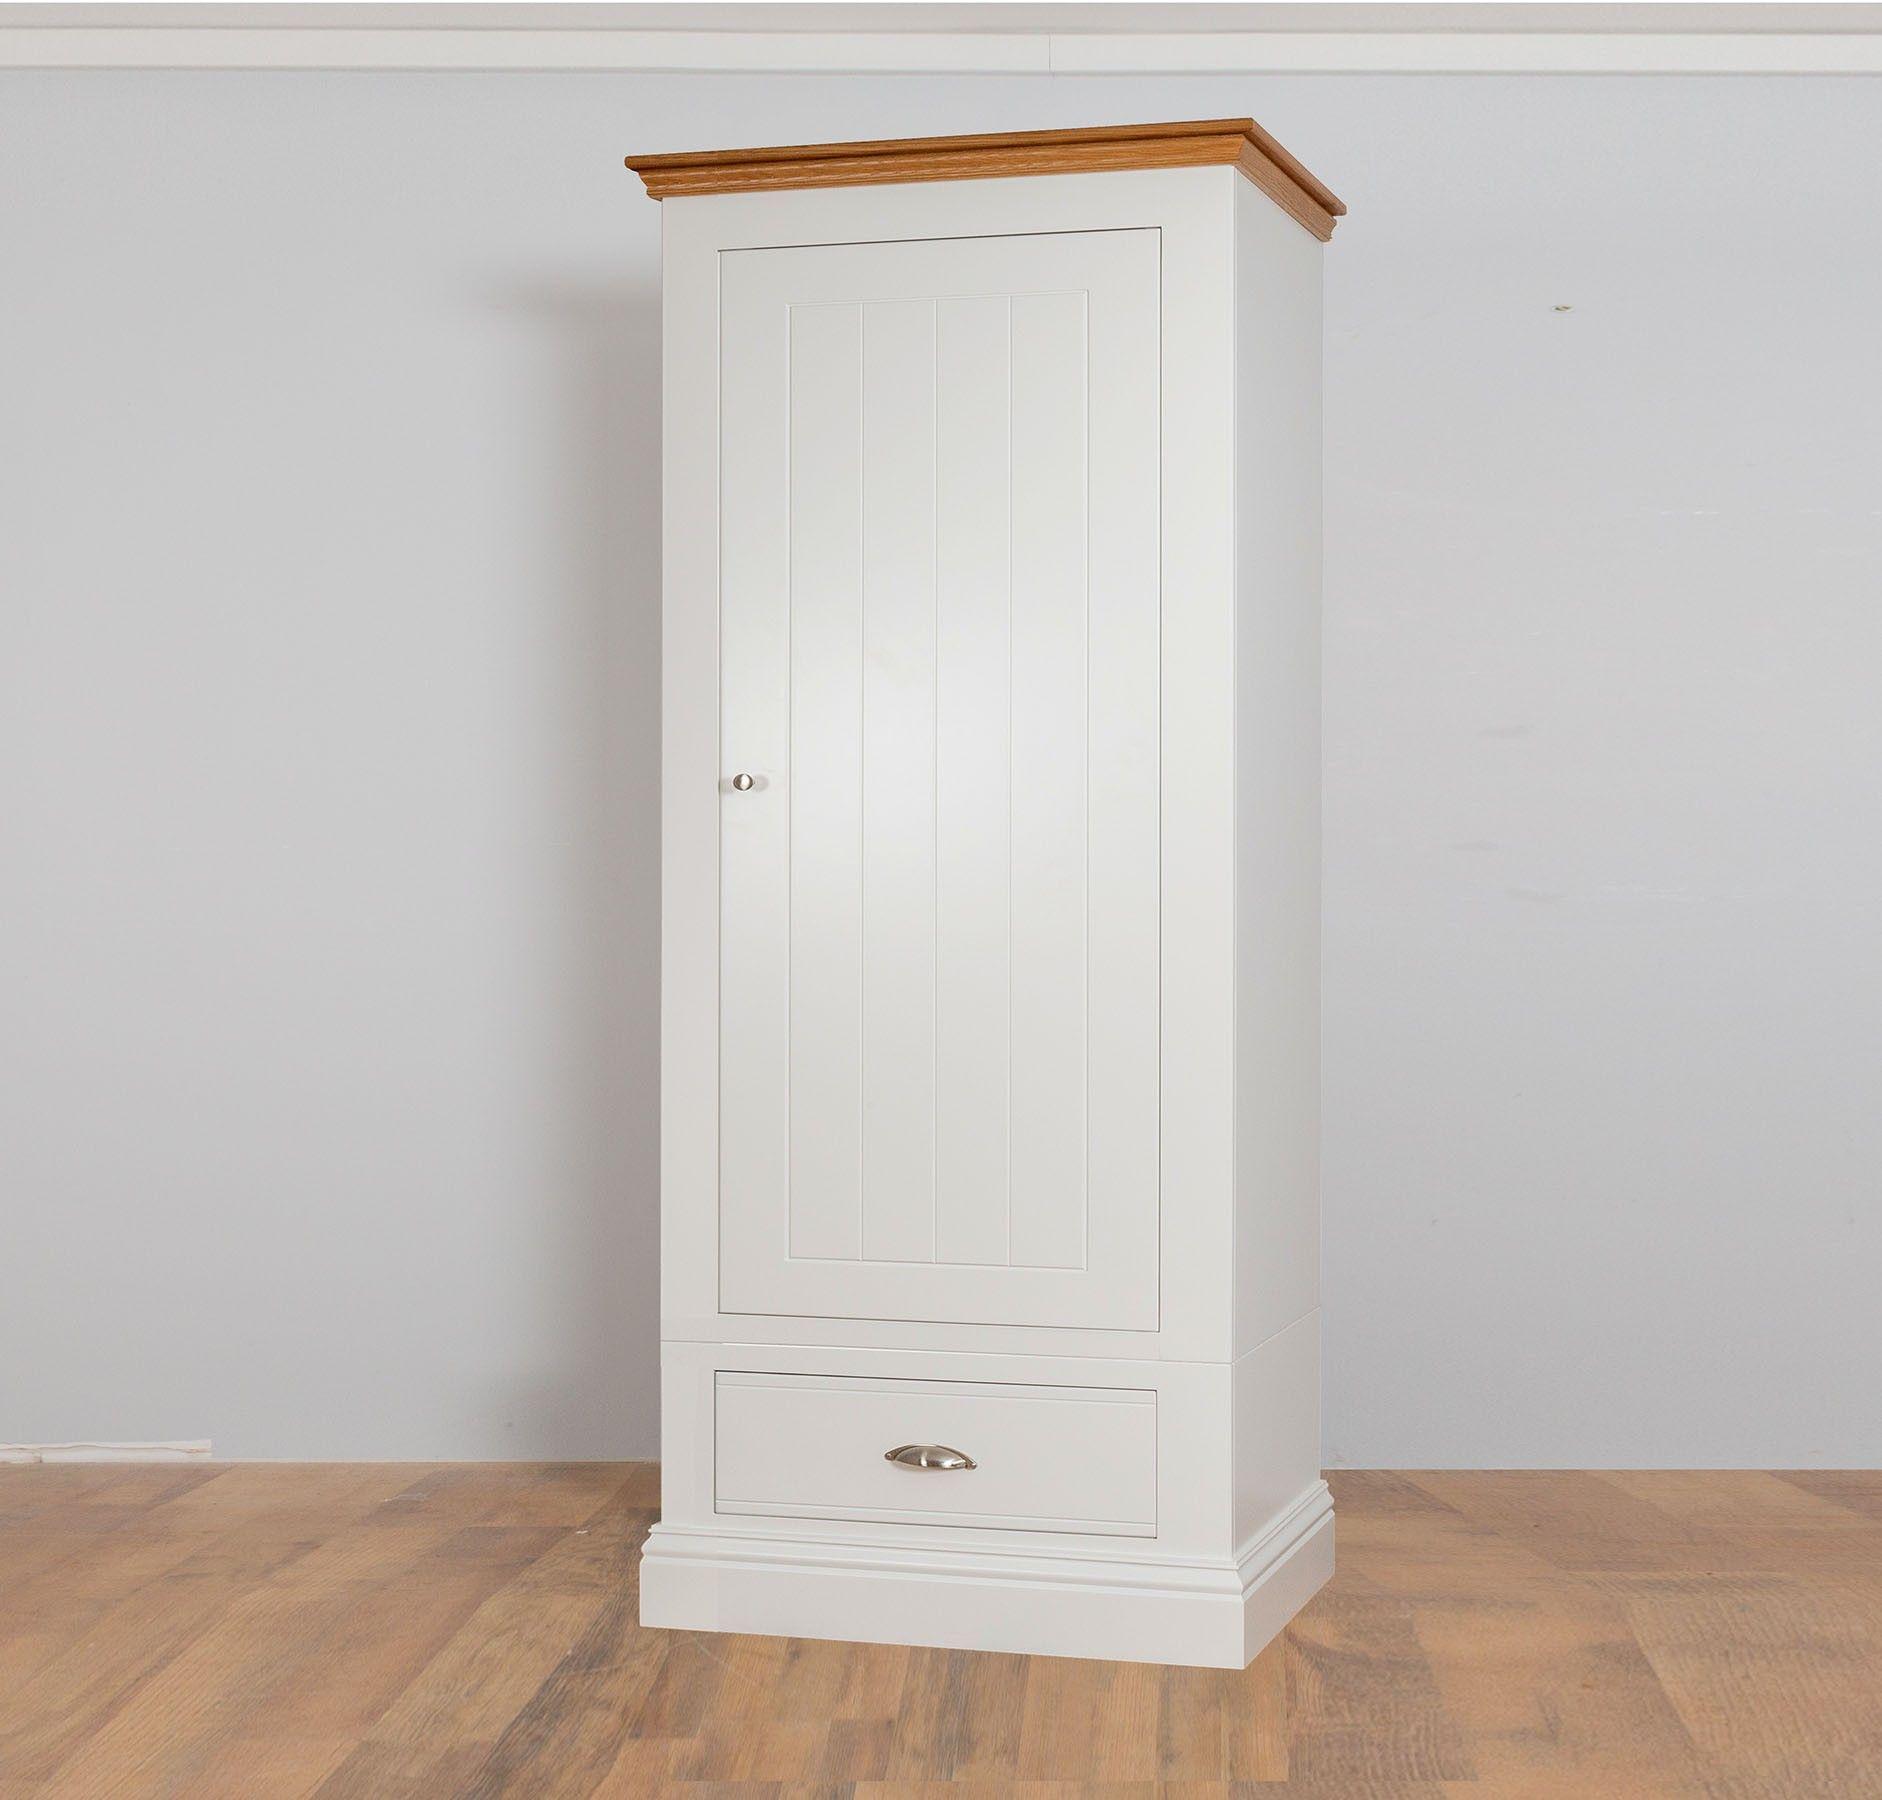 New England 50cm Wide Painted 1 Door Drawer Wardrobe In 2 Heights